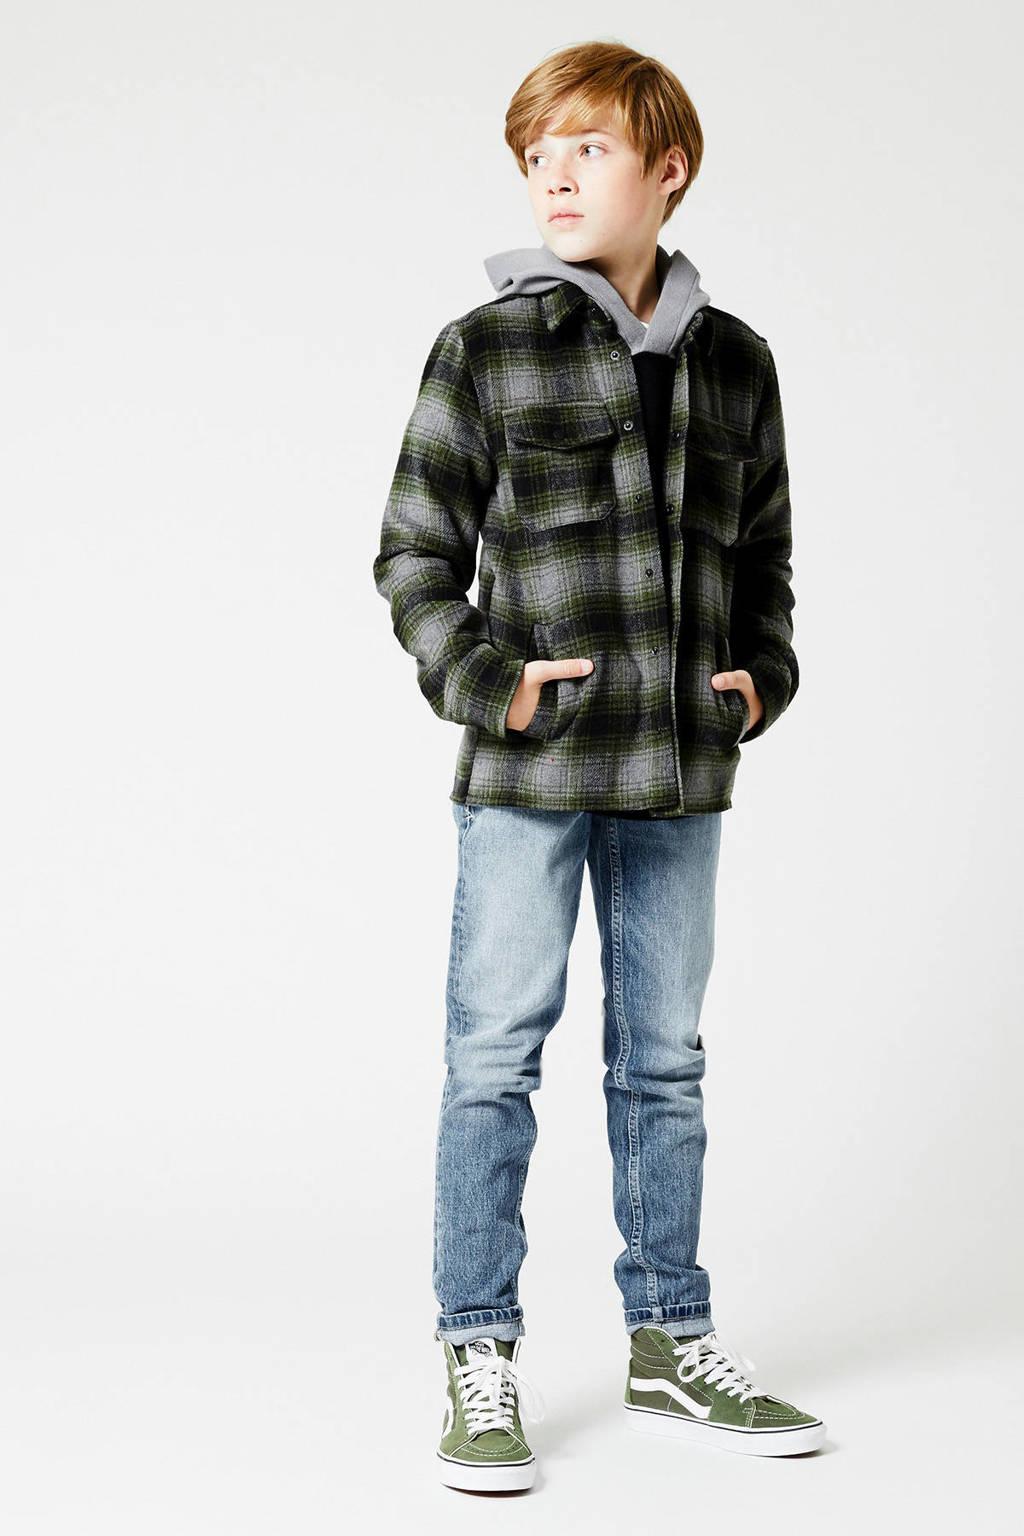 America Today Junior geruit overhemd Holt zwart/donkergroen, Zwart/donkergroen